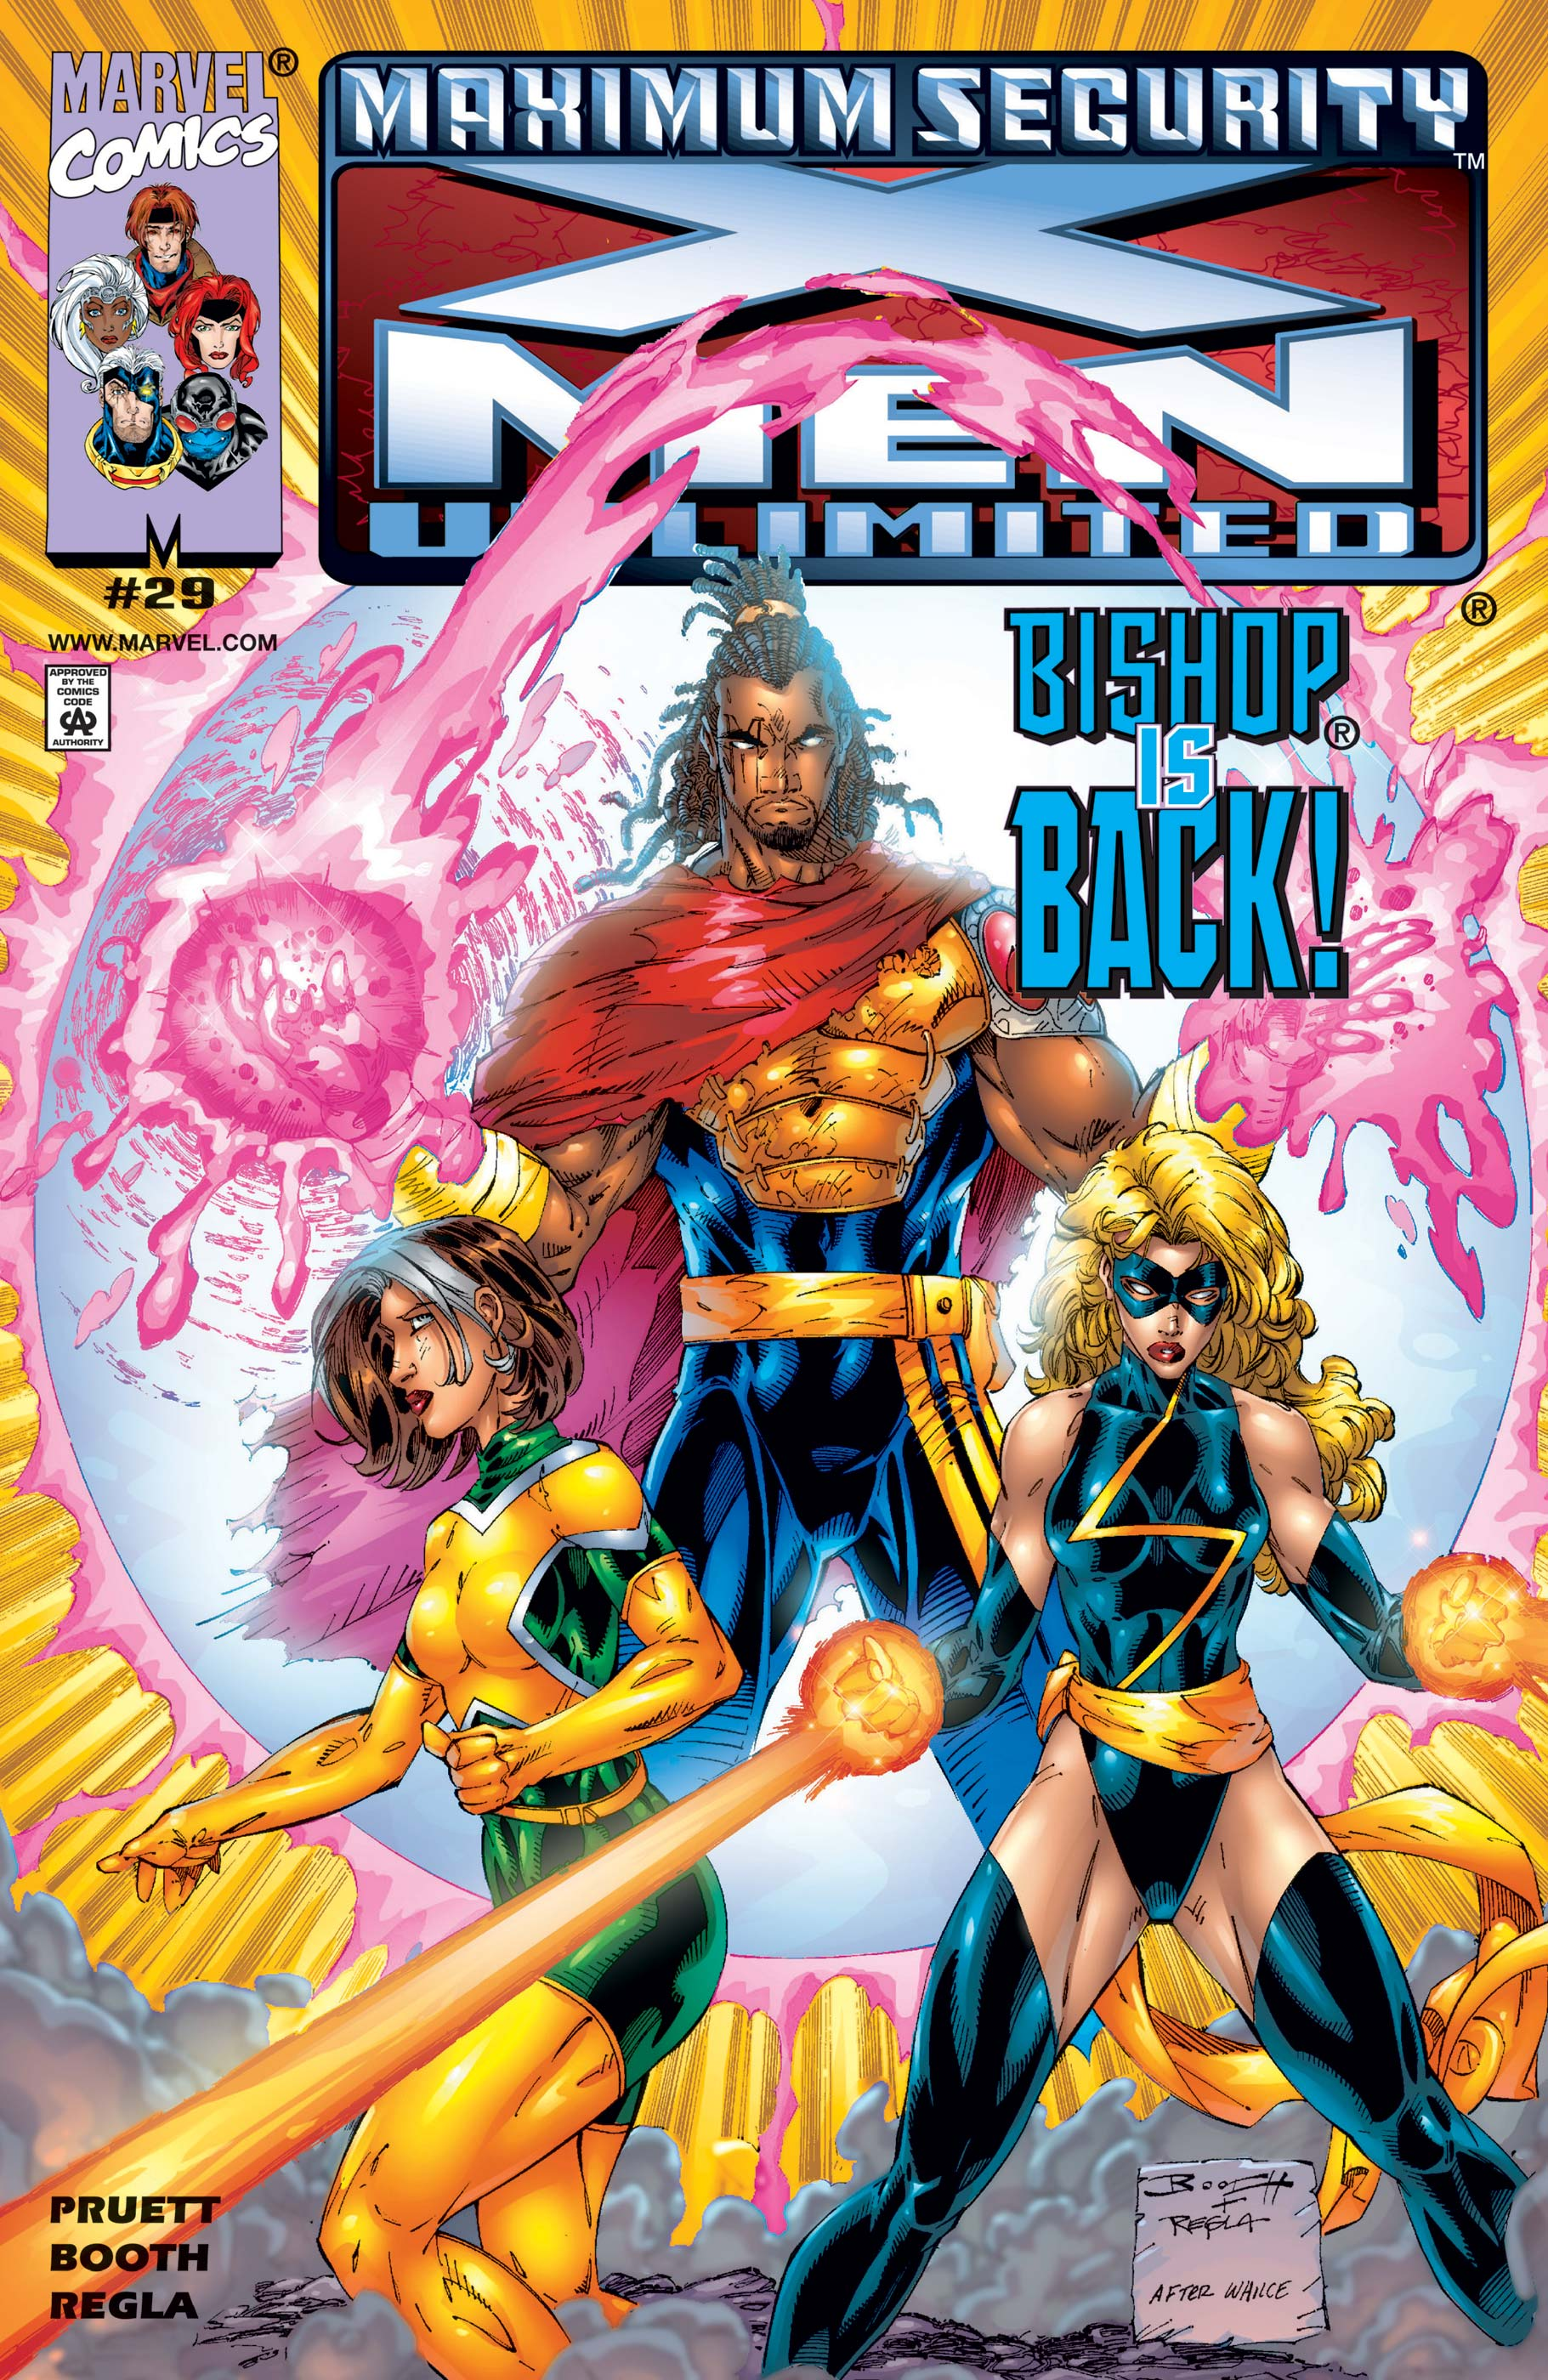 X-Men Unlimited (1993) #29